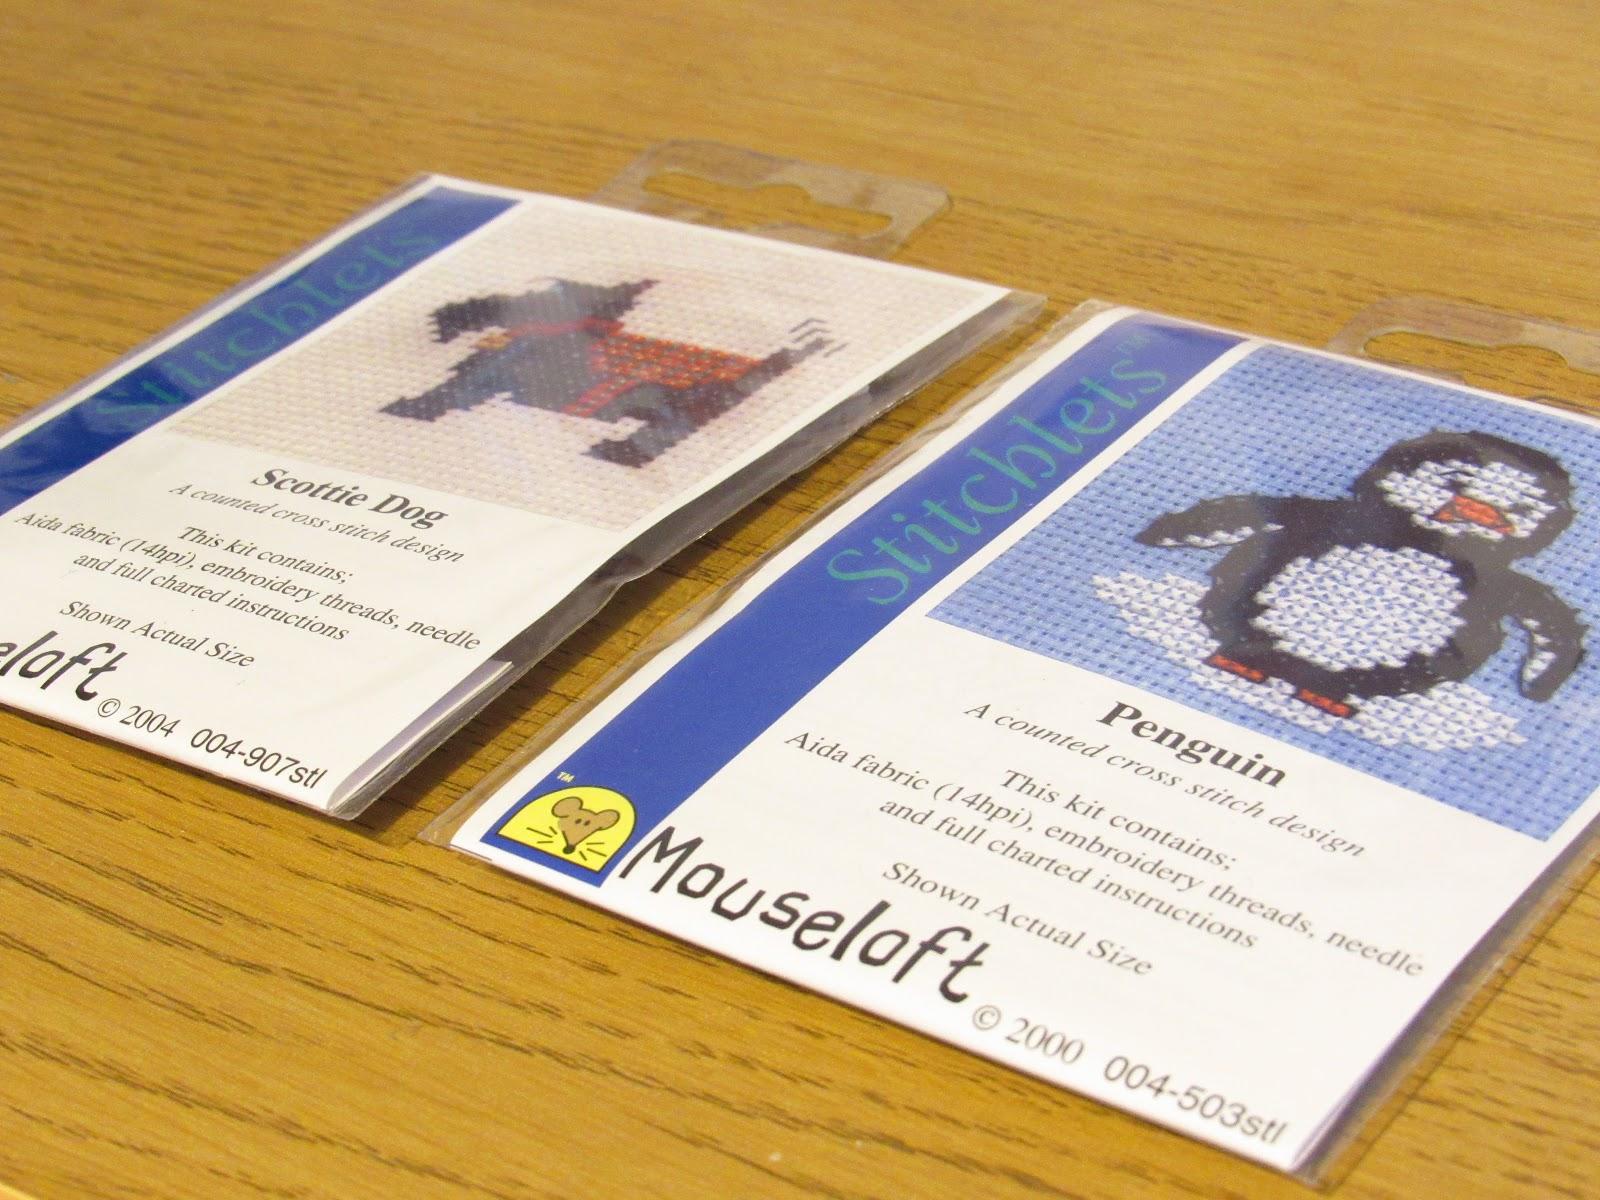 Hobbycraft Mini Cross Stitch Kits of penguin and scottie dog